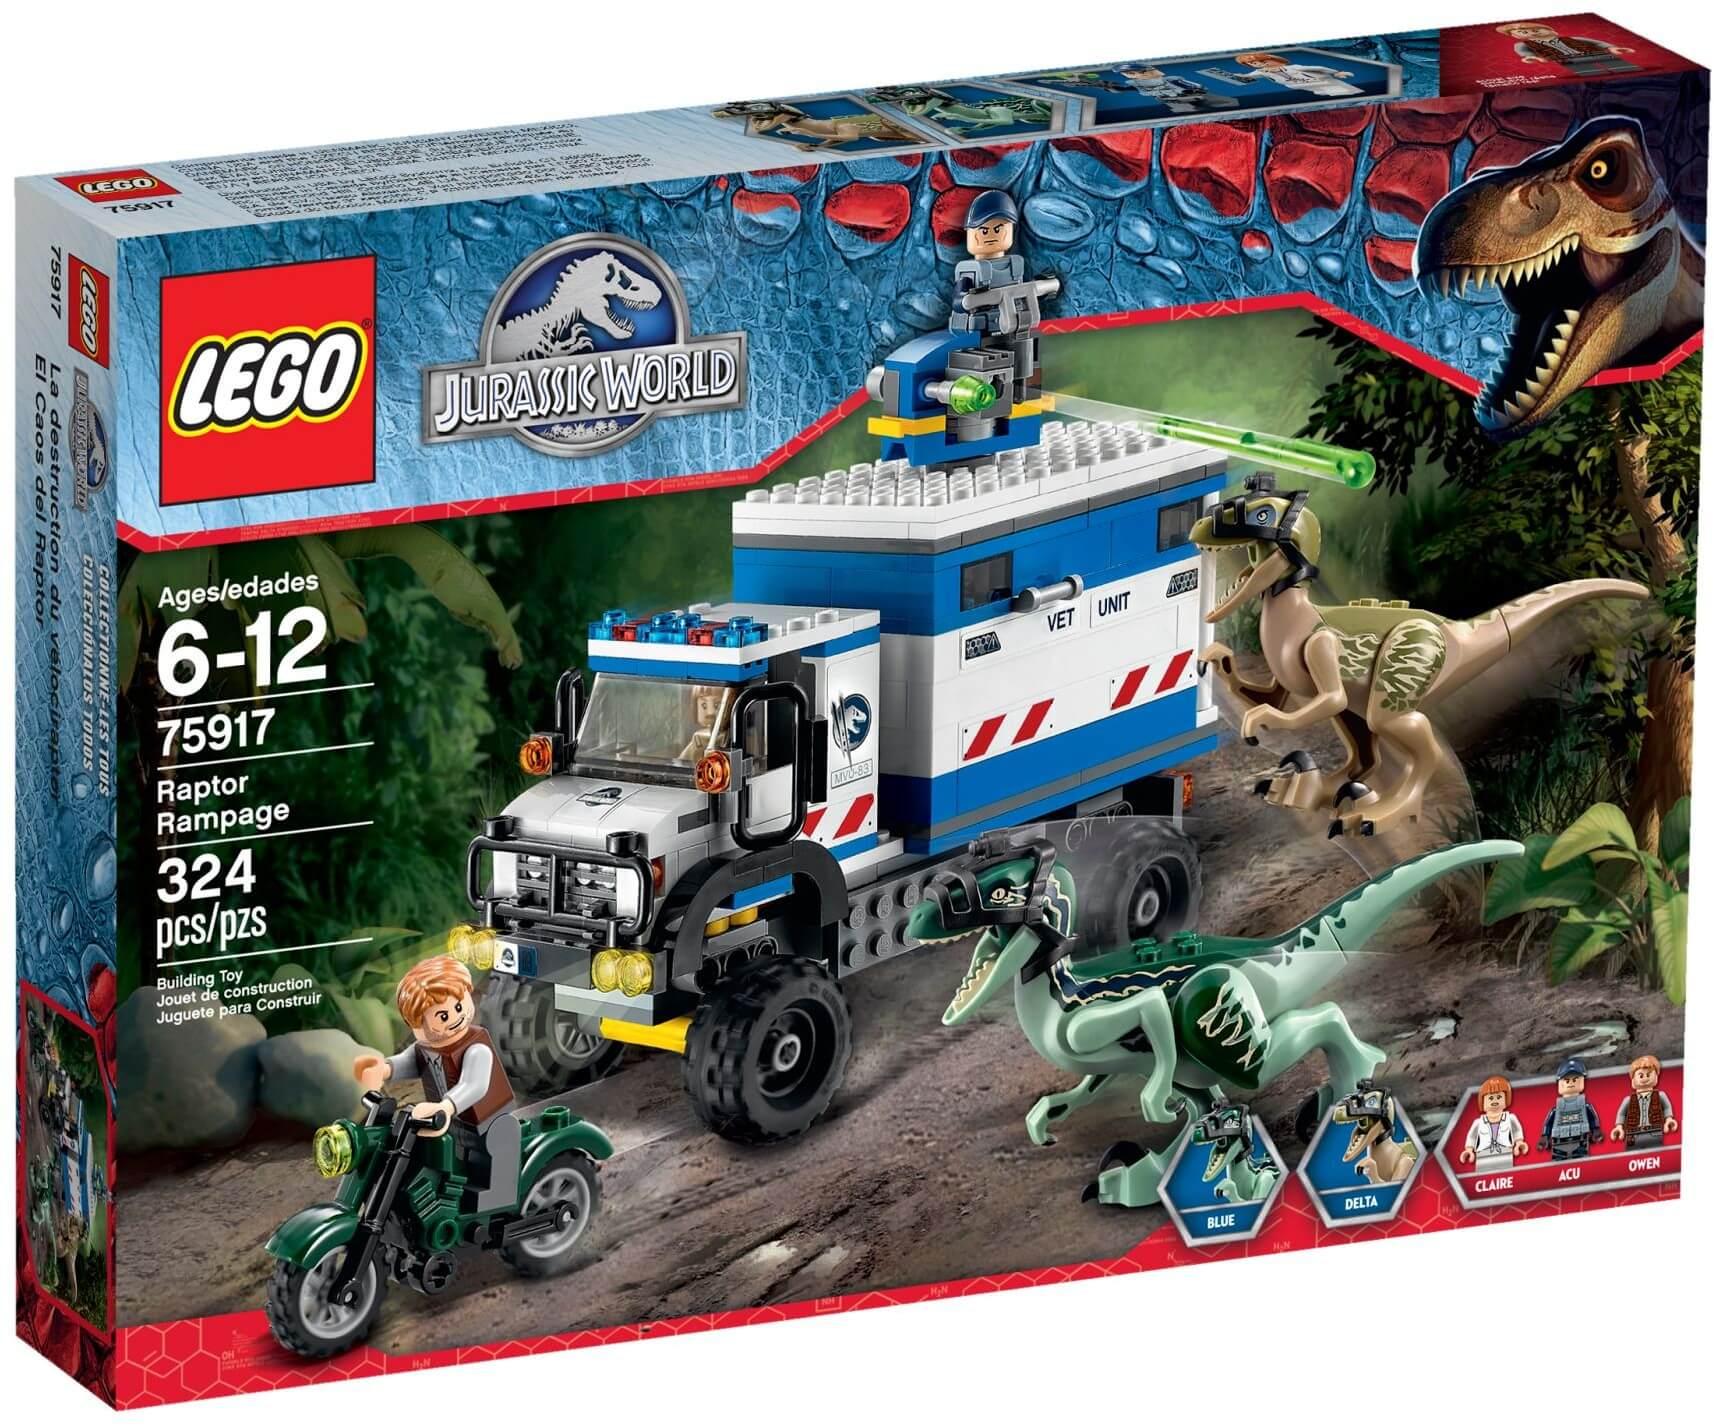 Mua đồ chơi LEGO 75917 - LEGO Jurassic World 75917 - Khủng long Săn mồi Raptor nổi loạn (LEGO Jurassic World Raptor Rampage 75917)